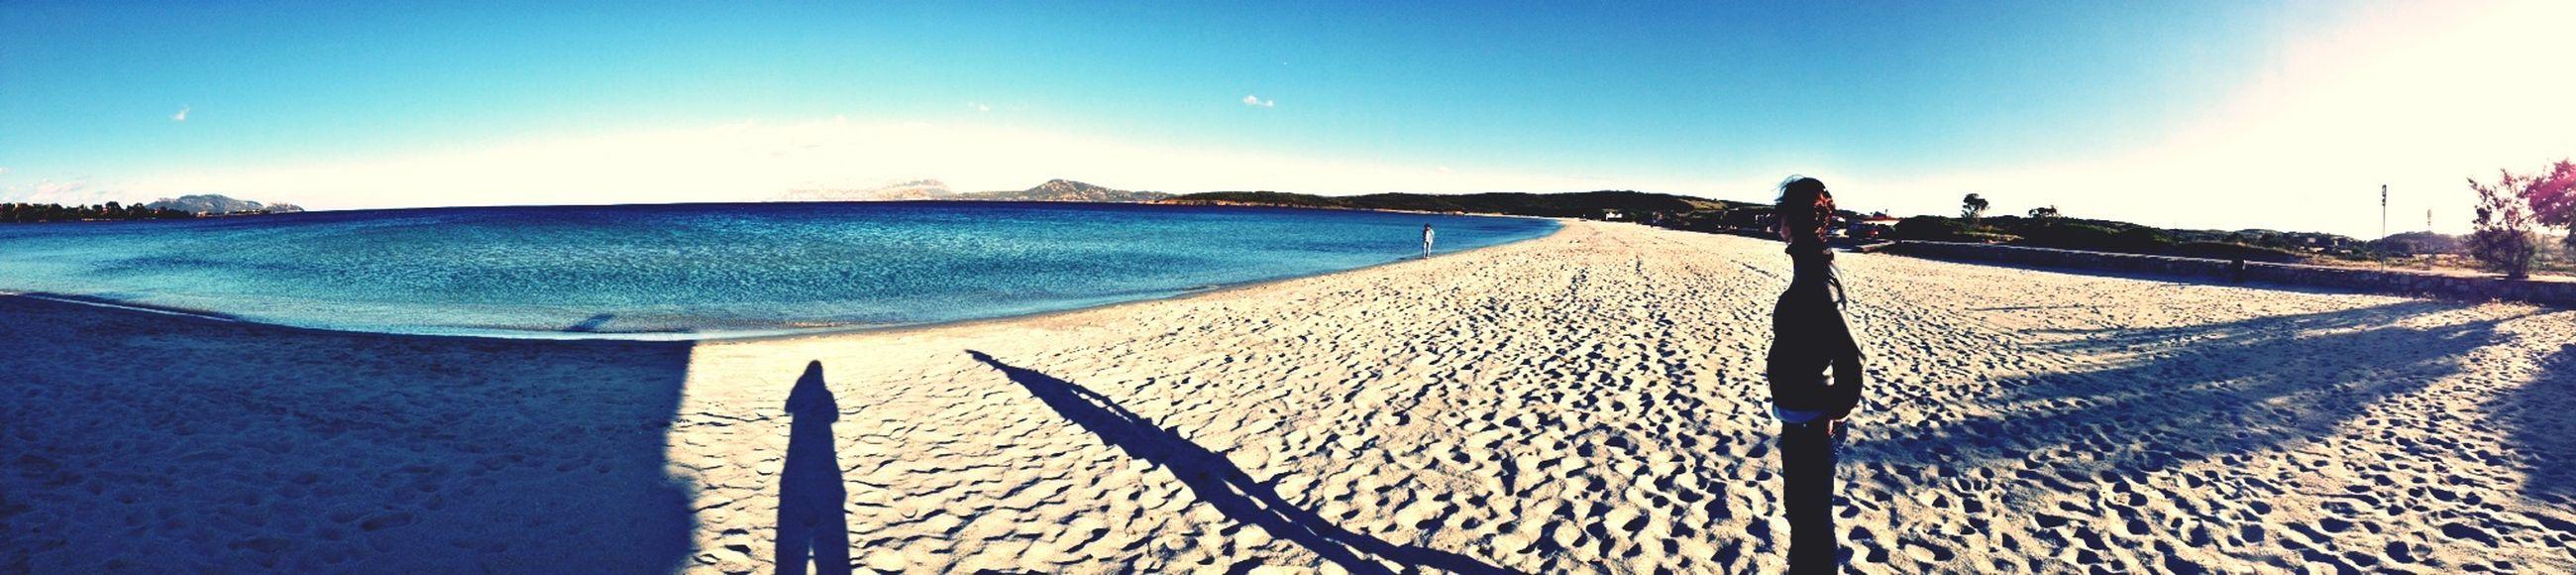 Sardinia Panorama Enjoying The Sun